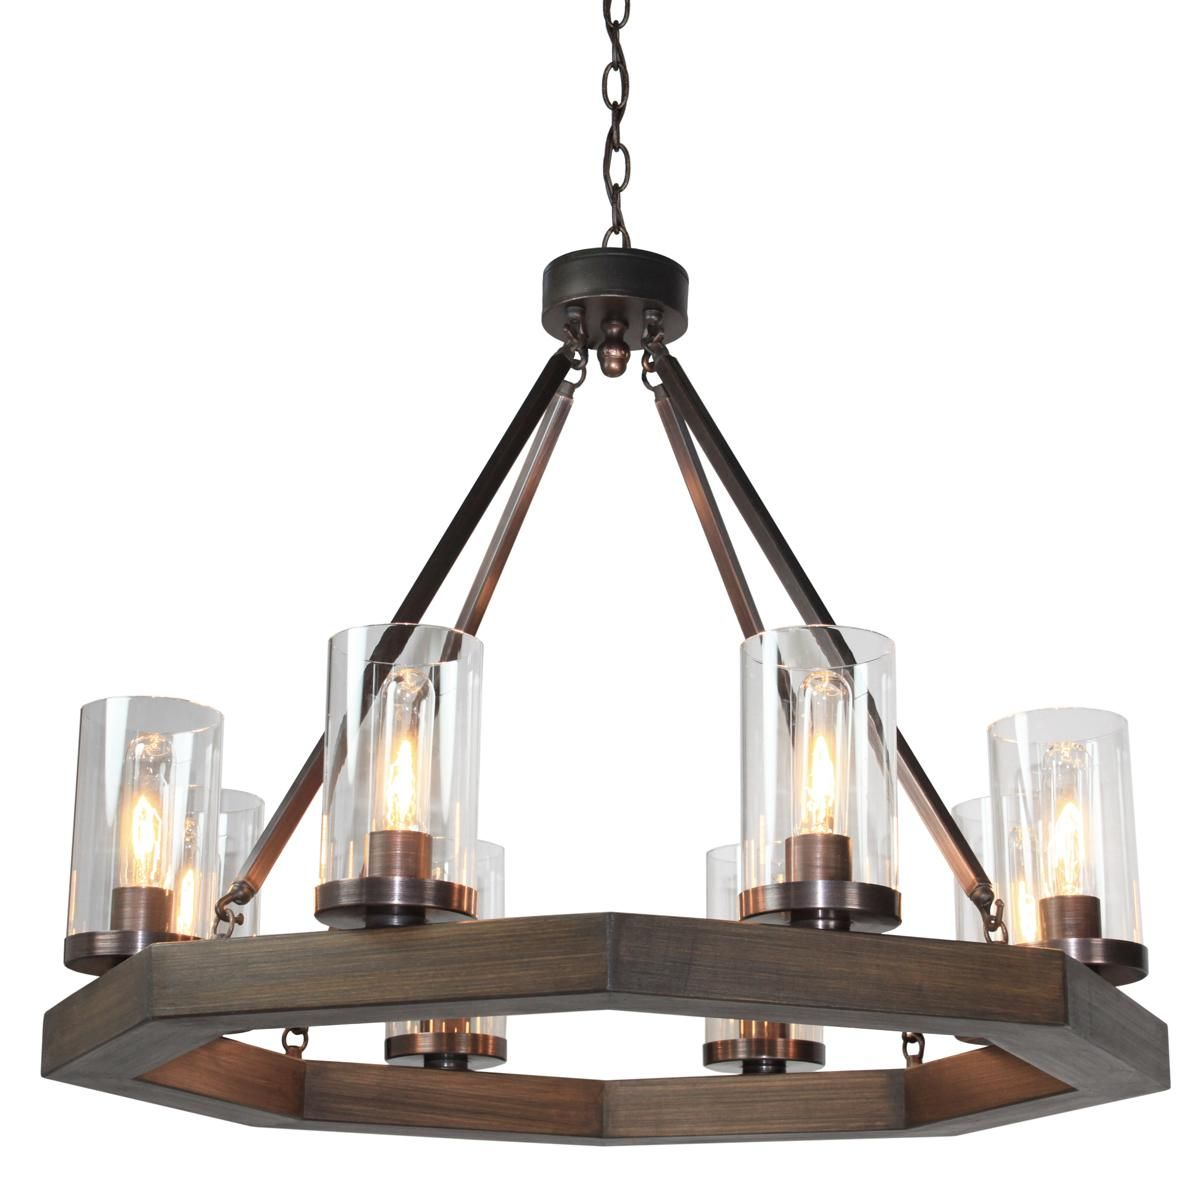 Medieval Modern 8-Light Octagon Chandelier | Lighting ...